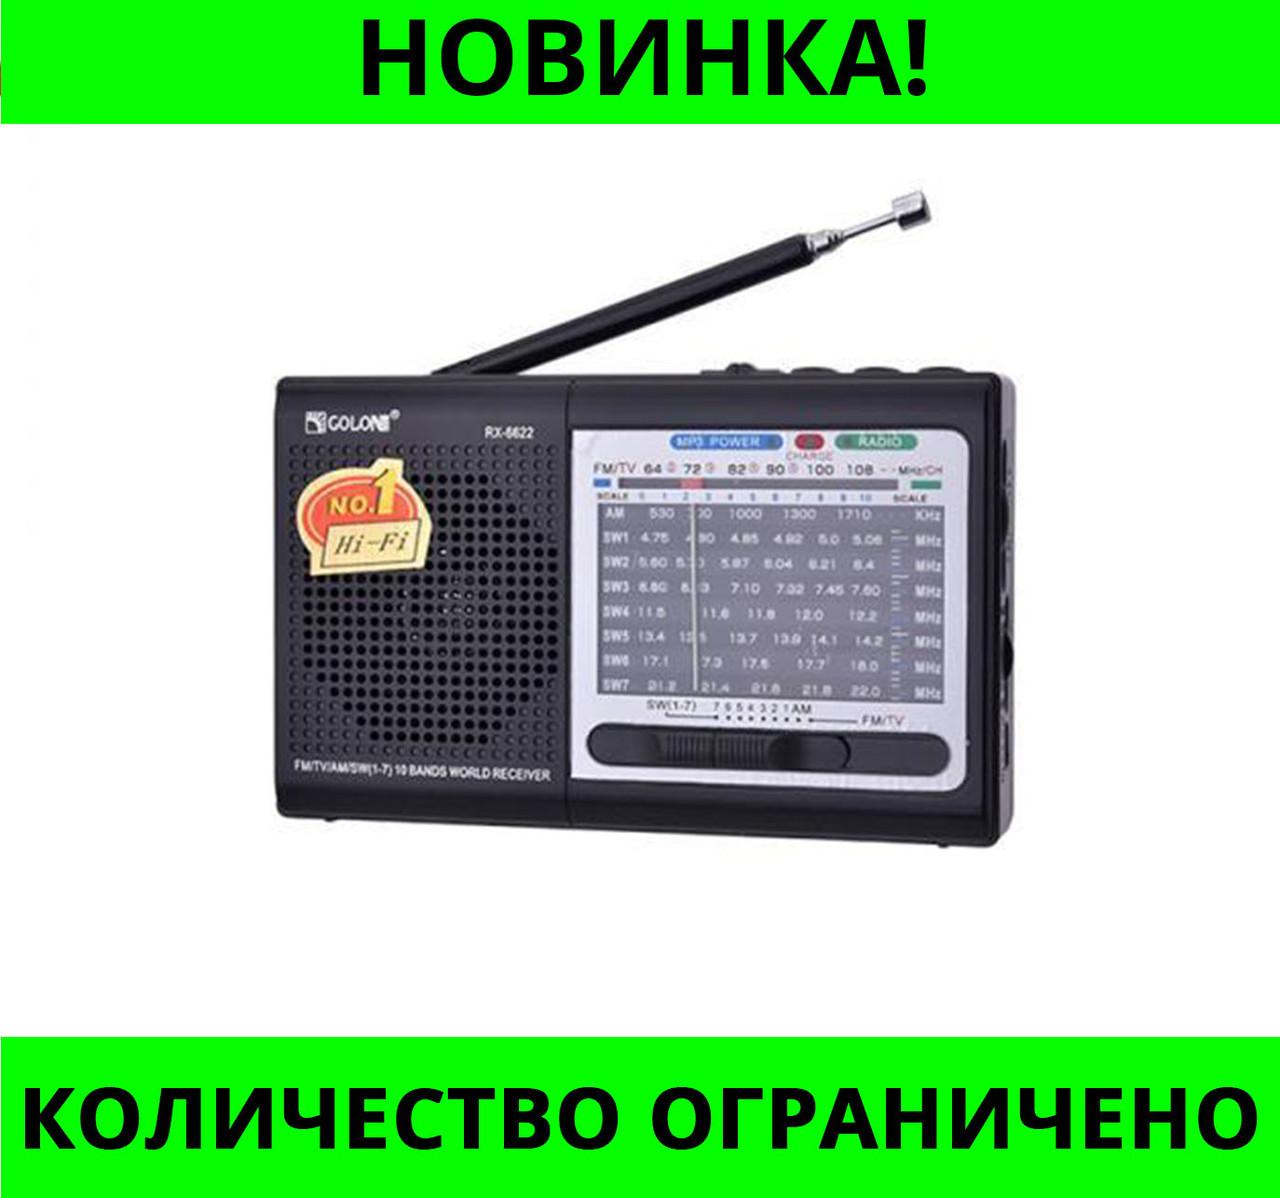 Радиоприёмник GOLON RX-6622!Розница и Опт